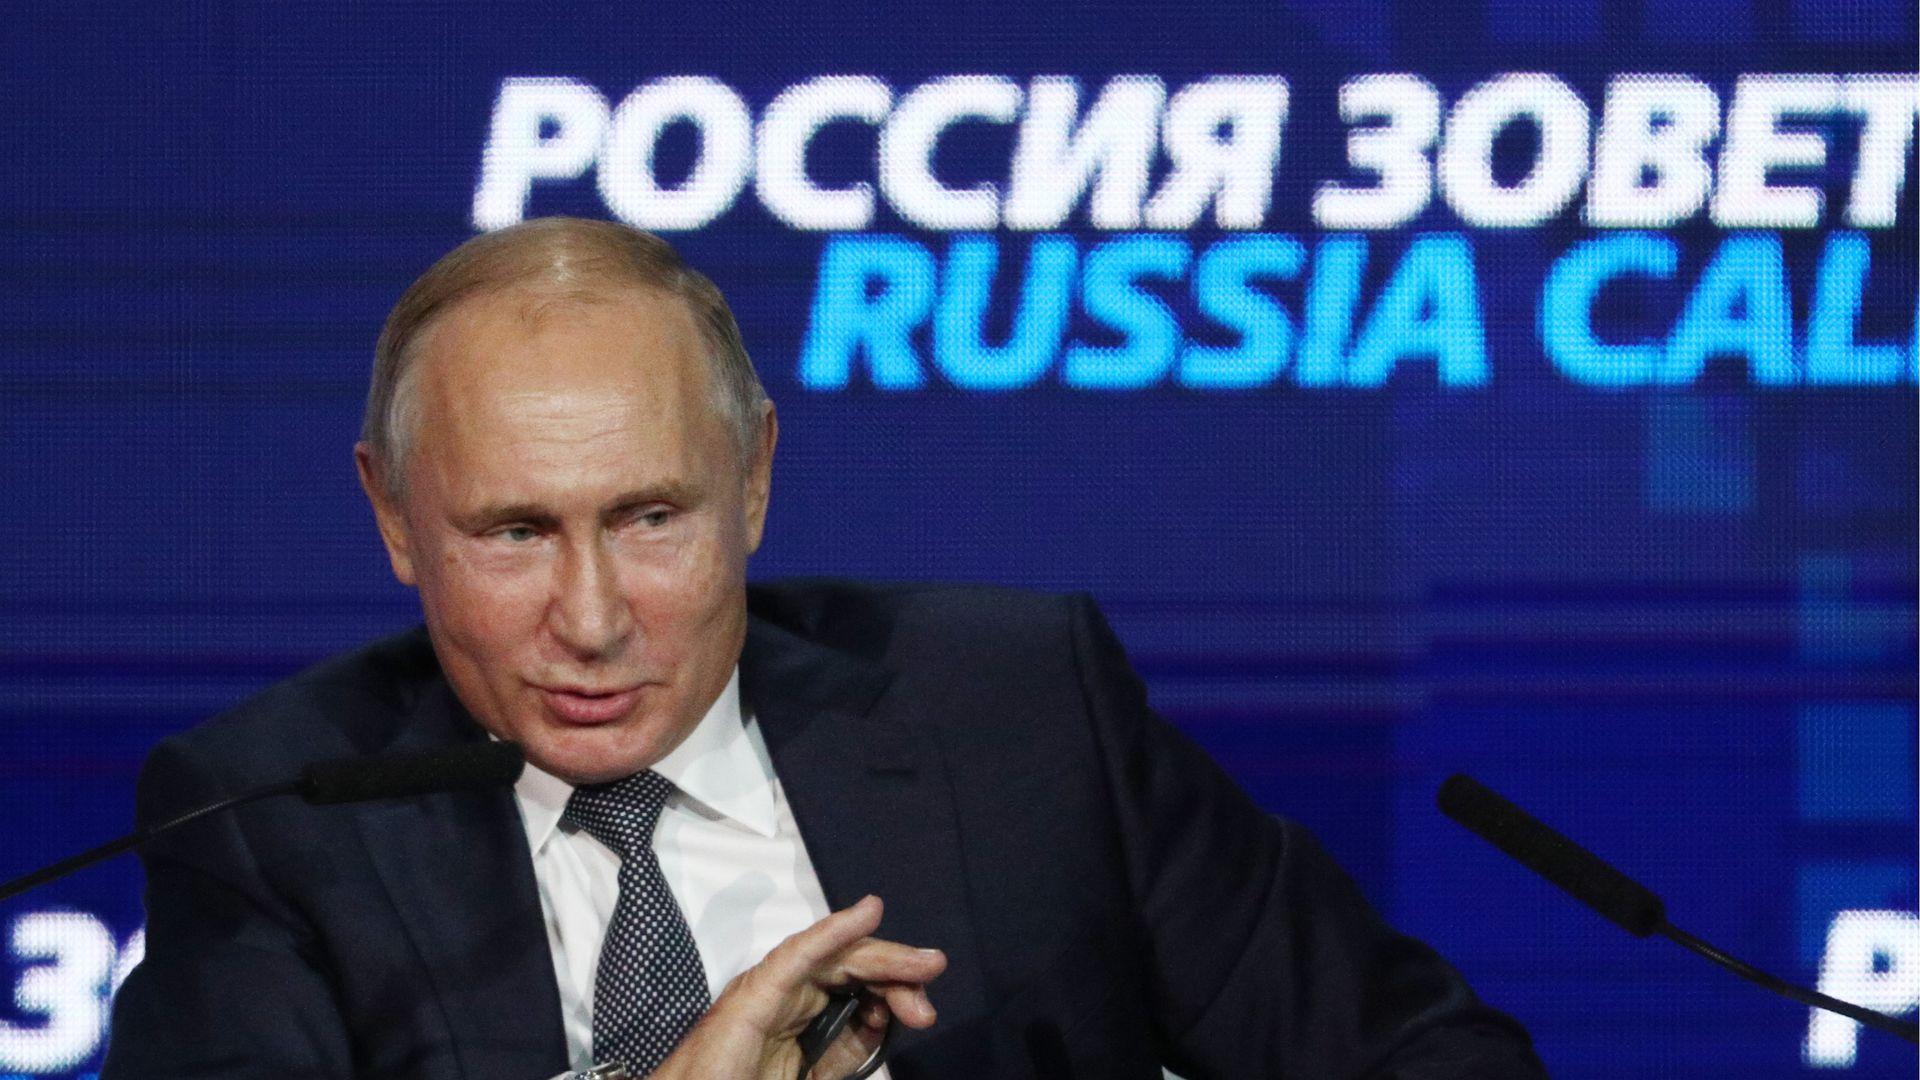 Vladimir Putin smiles and gestures.